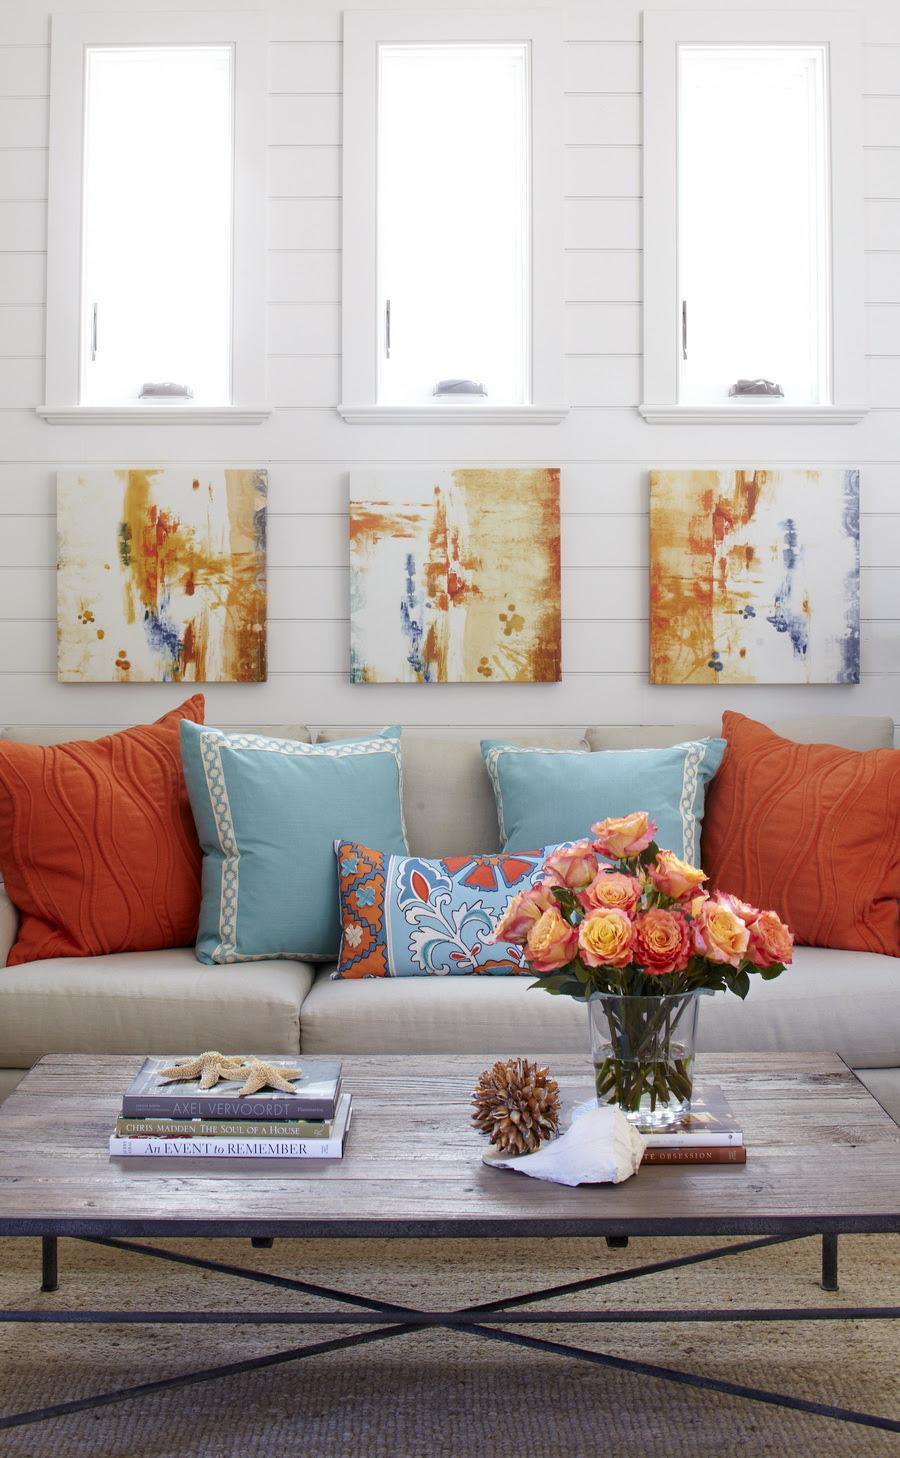 Interiores tracery 3